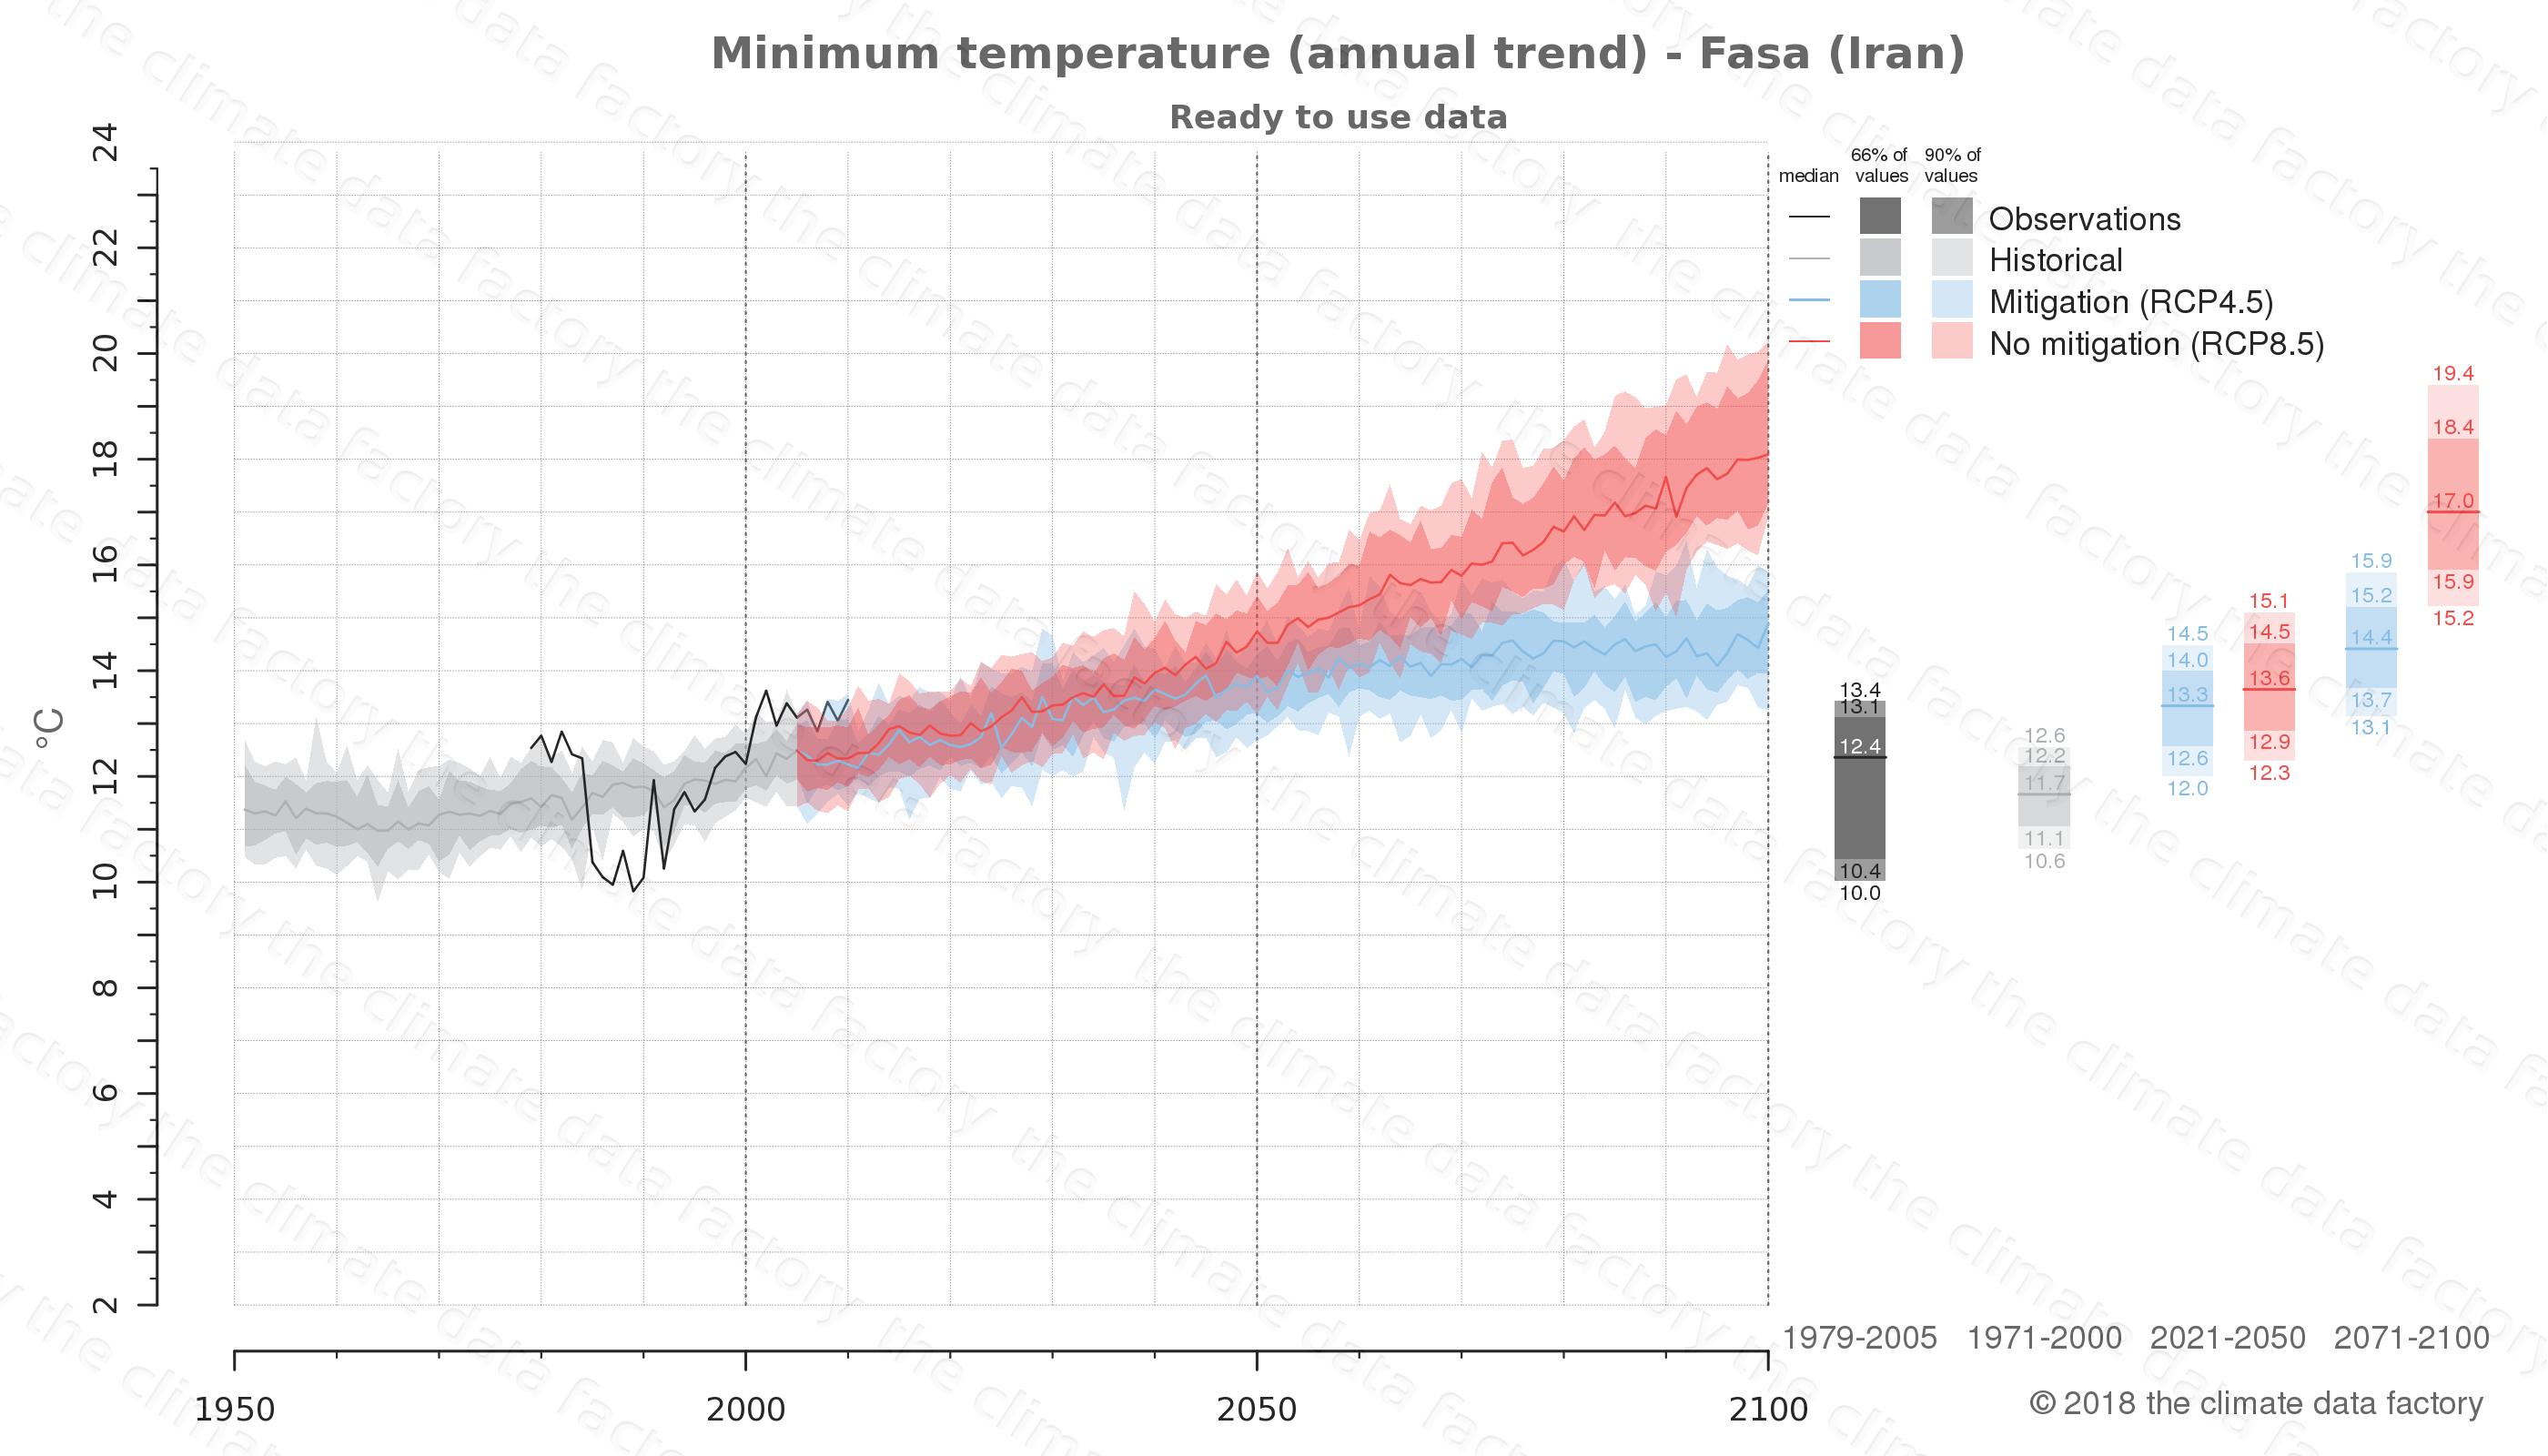 climate change data policy adaptation climate graph city data minimum-temperature fasa iran